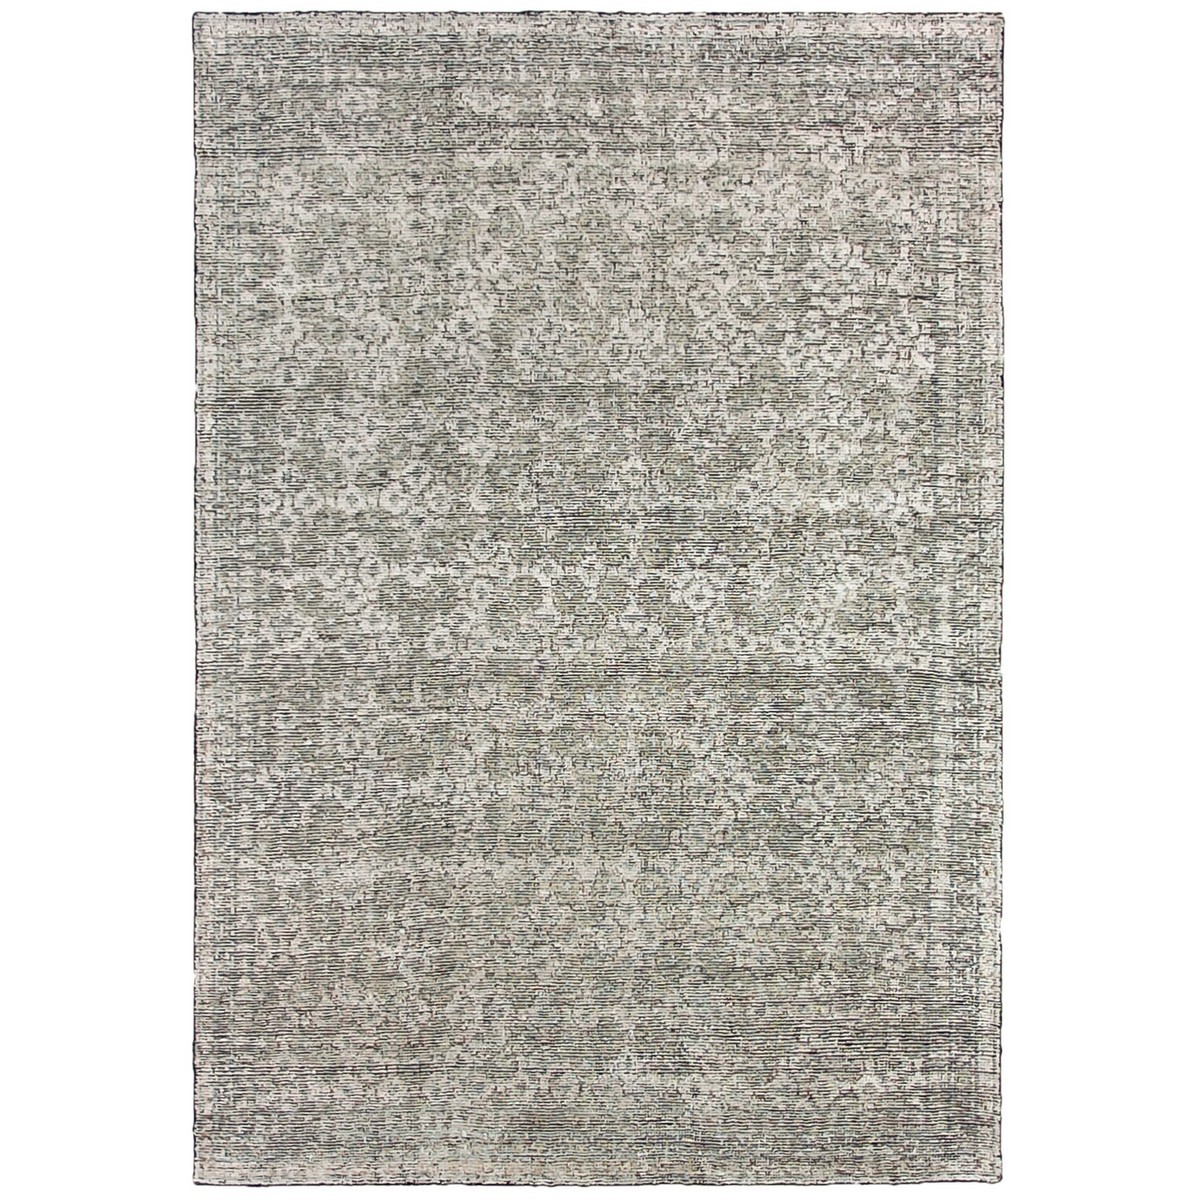 Revival Oushak Hand Knotted Wool & Viscose Rug, 200x300cm, Washed Indigo